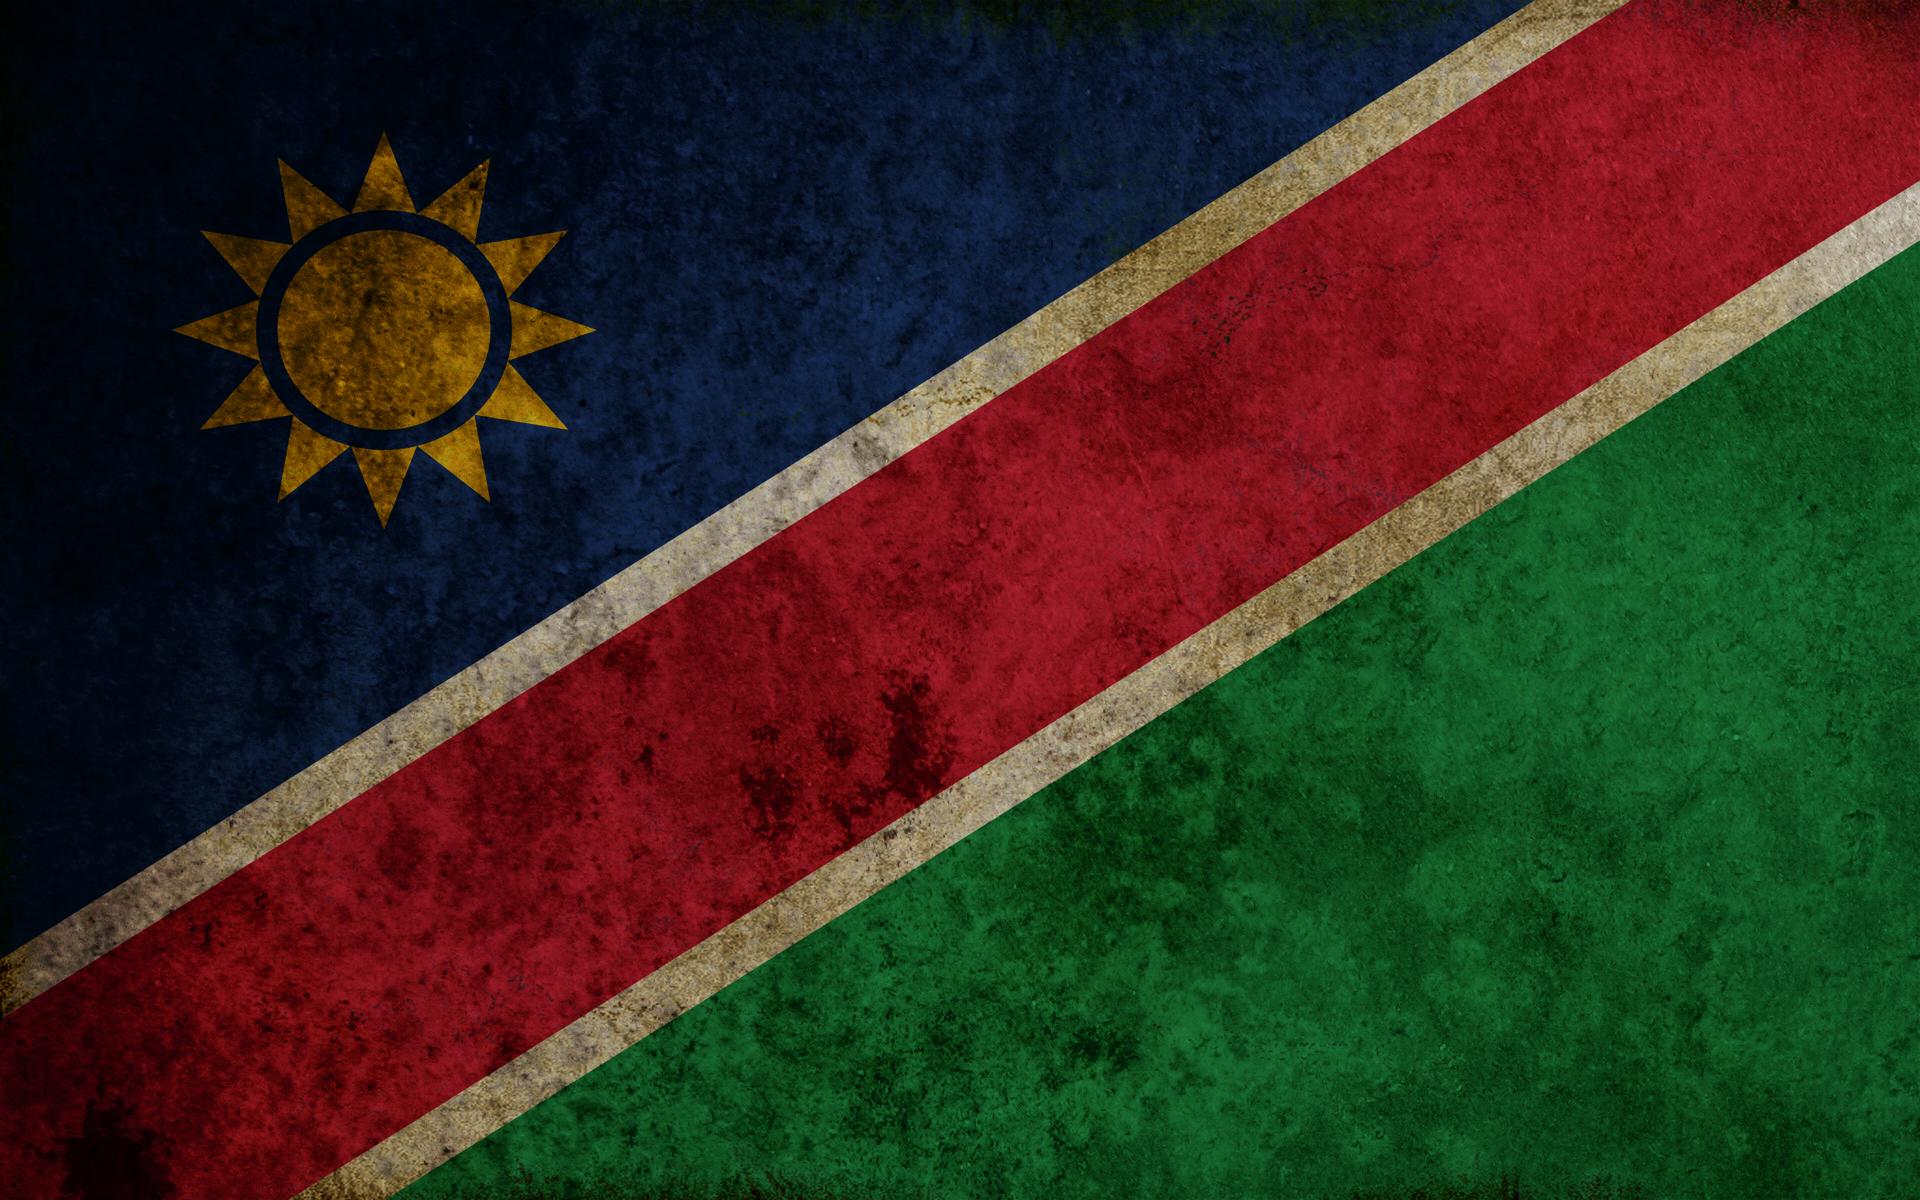 Flags Namibia wallpaper 1920x1200 228930 WallpaperUP 1920x1200